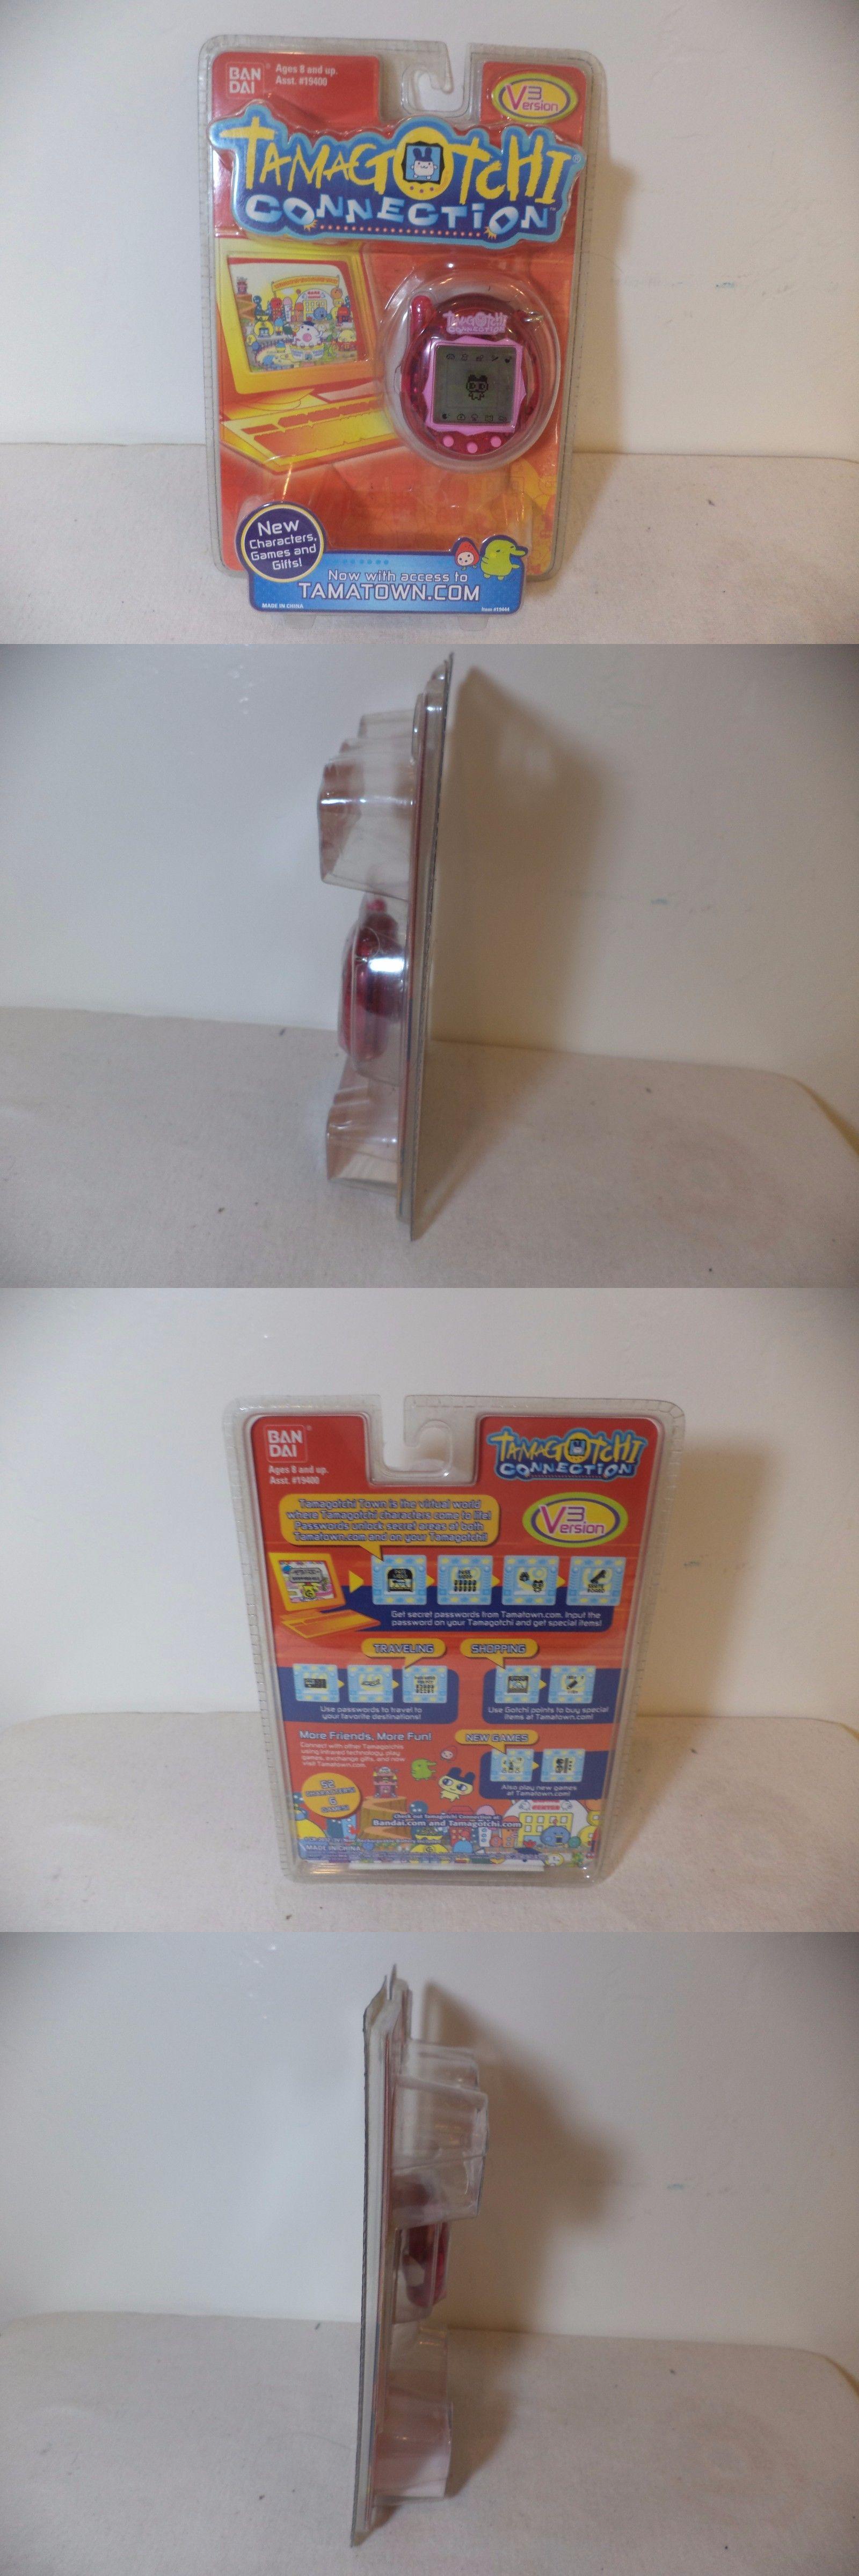 Tamagotchi Rare Bandai Tamagotchi Version Connection Virtual